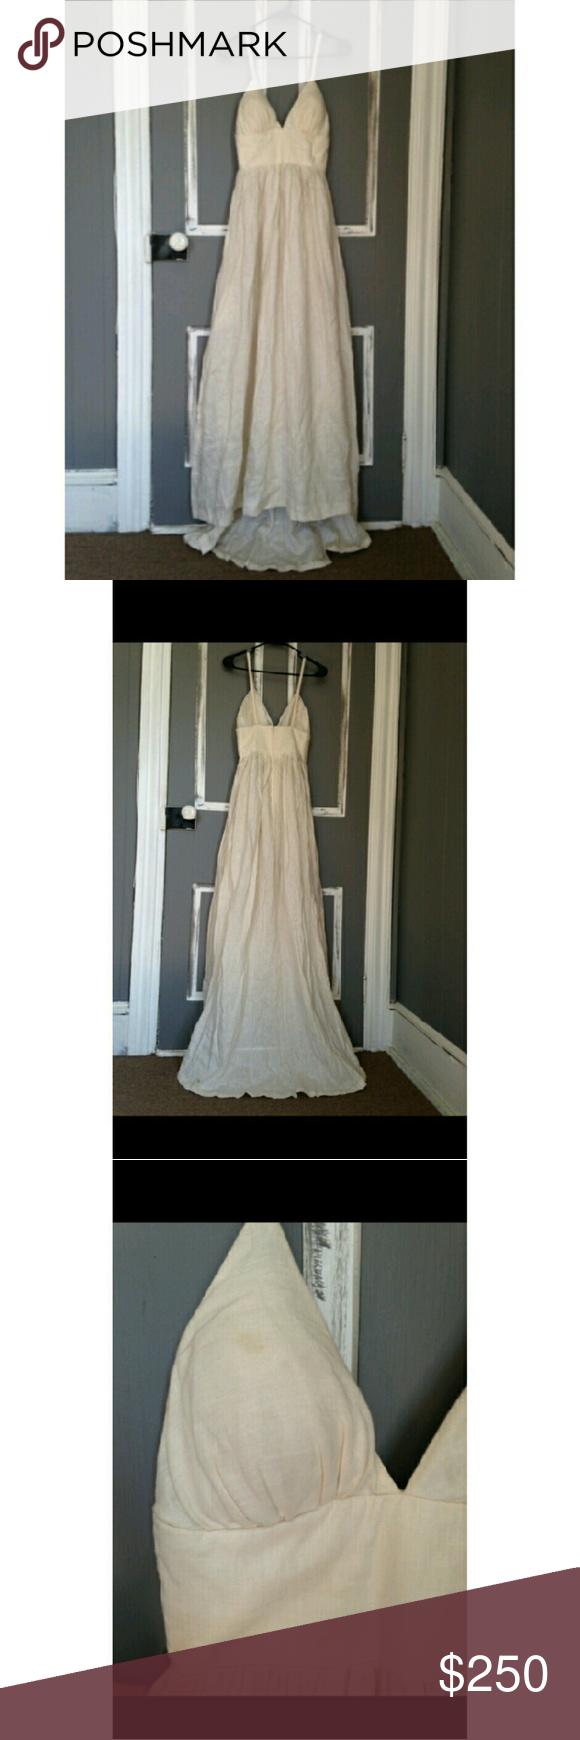 Wedding dress dry cleaning near me  J Crew custom Wedding dress ONE OF A KIND  PoshMark  Pinterest